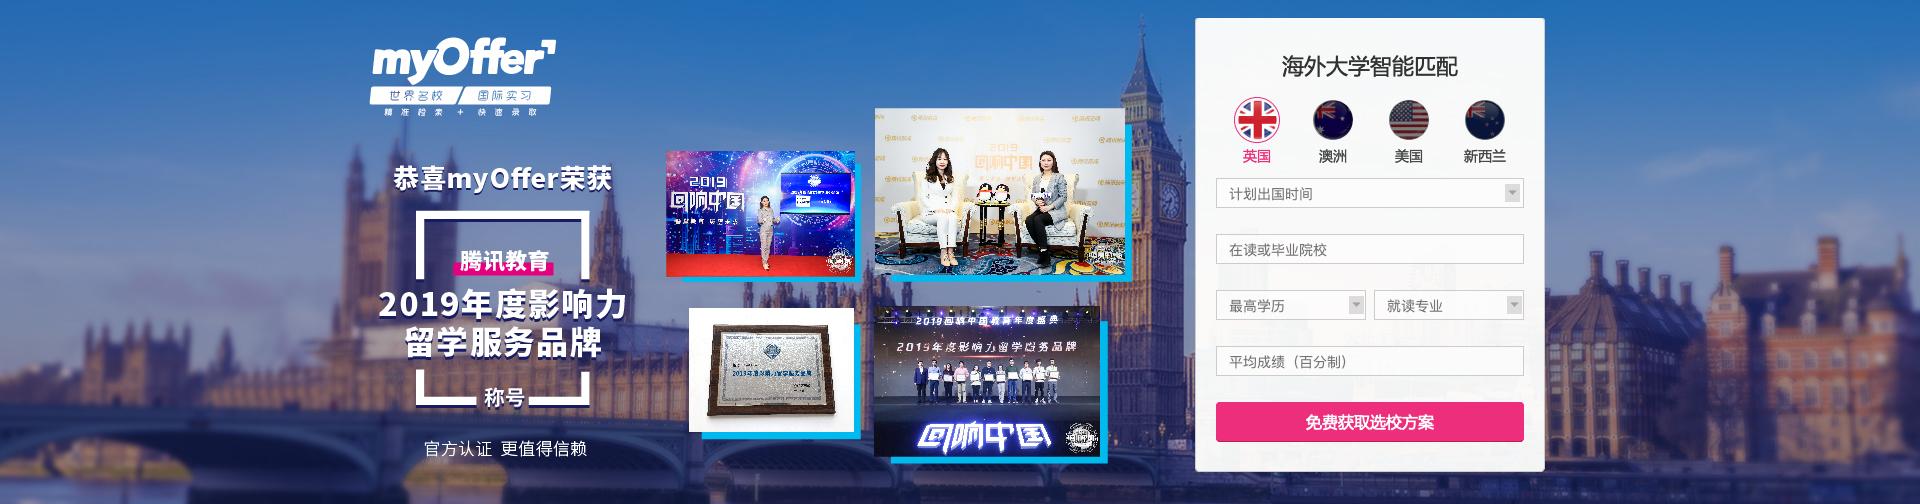 http://myoffer-public.oss-cn-shenzhen.aliyuncs.com/banners/37a123a12f658f6aeb87aa12402c31ad-605255-1920x504.jpg